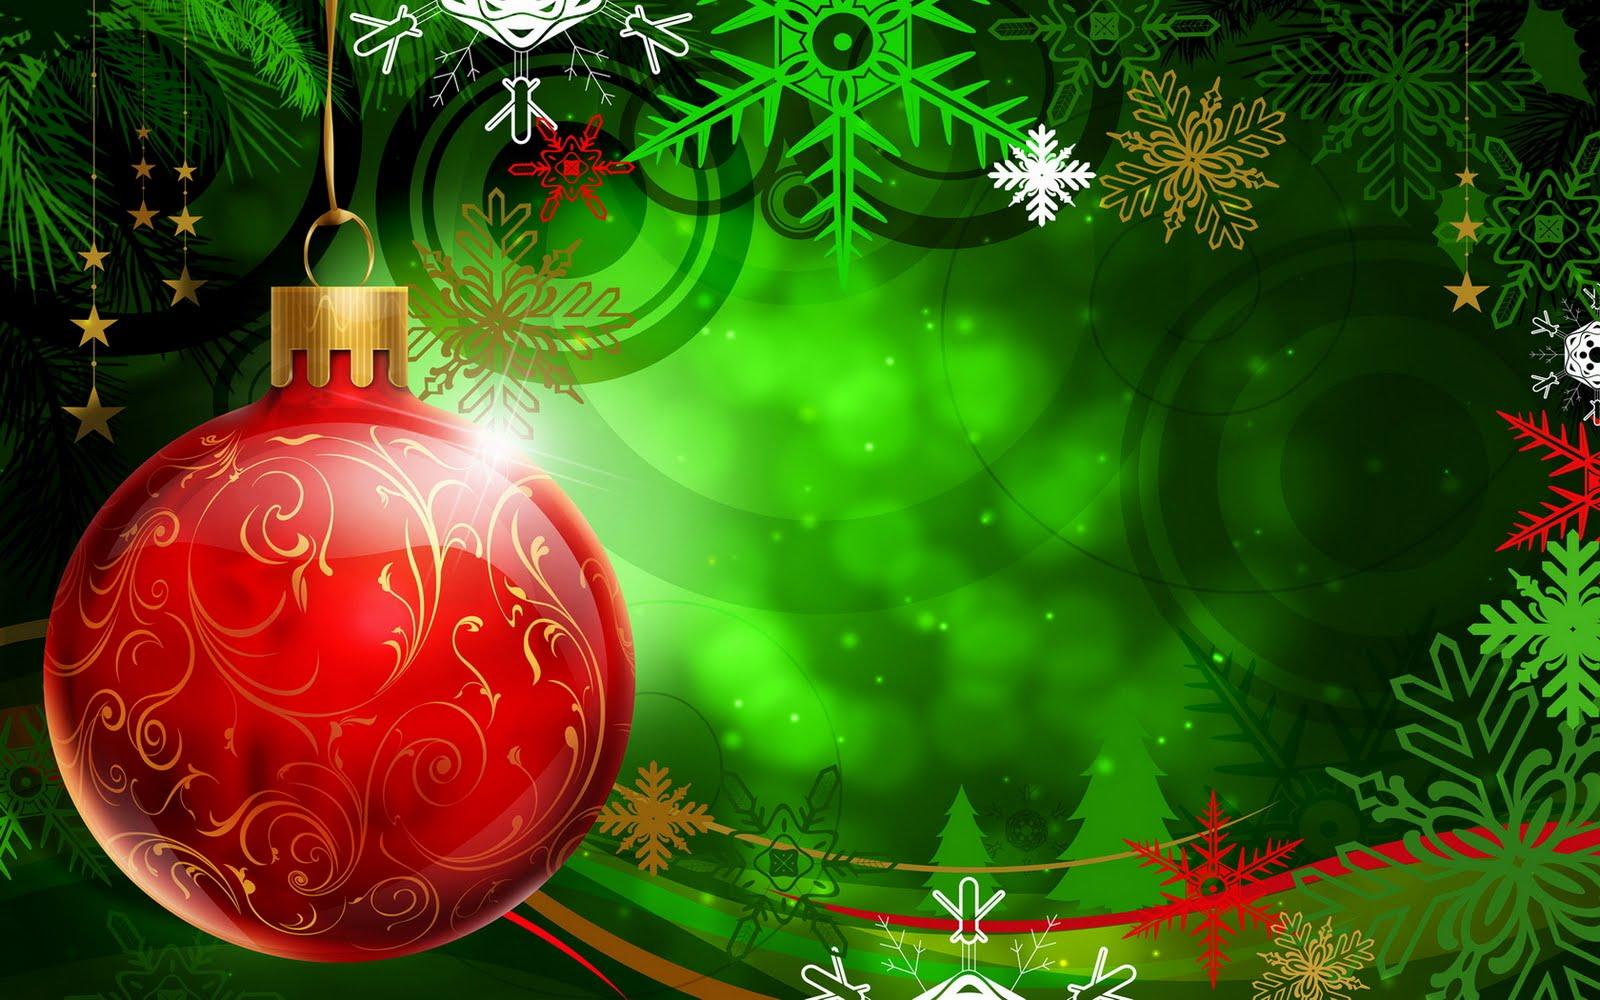 Christmas Wallpapers X mas Backgrounds  Animated 1600x1000